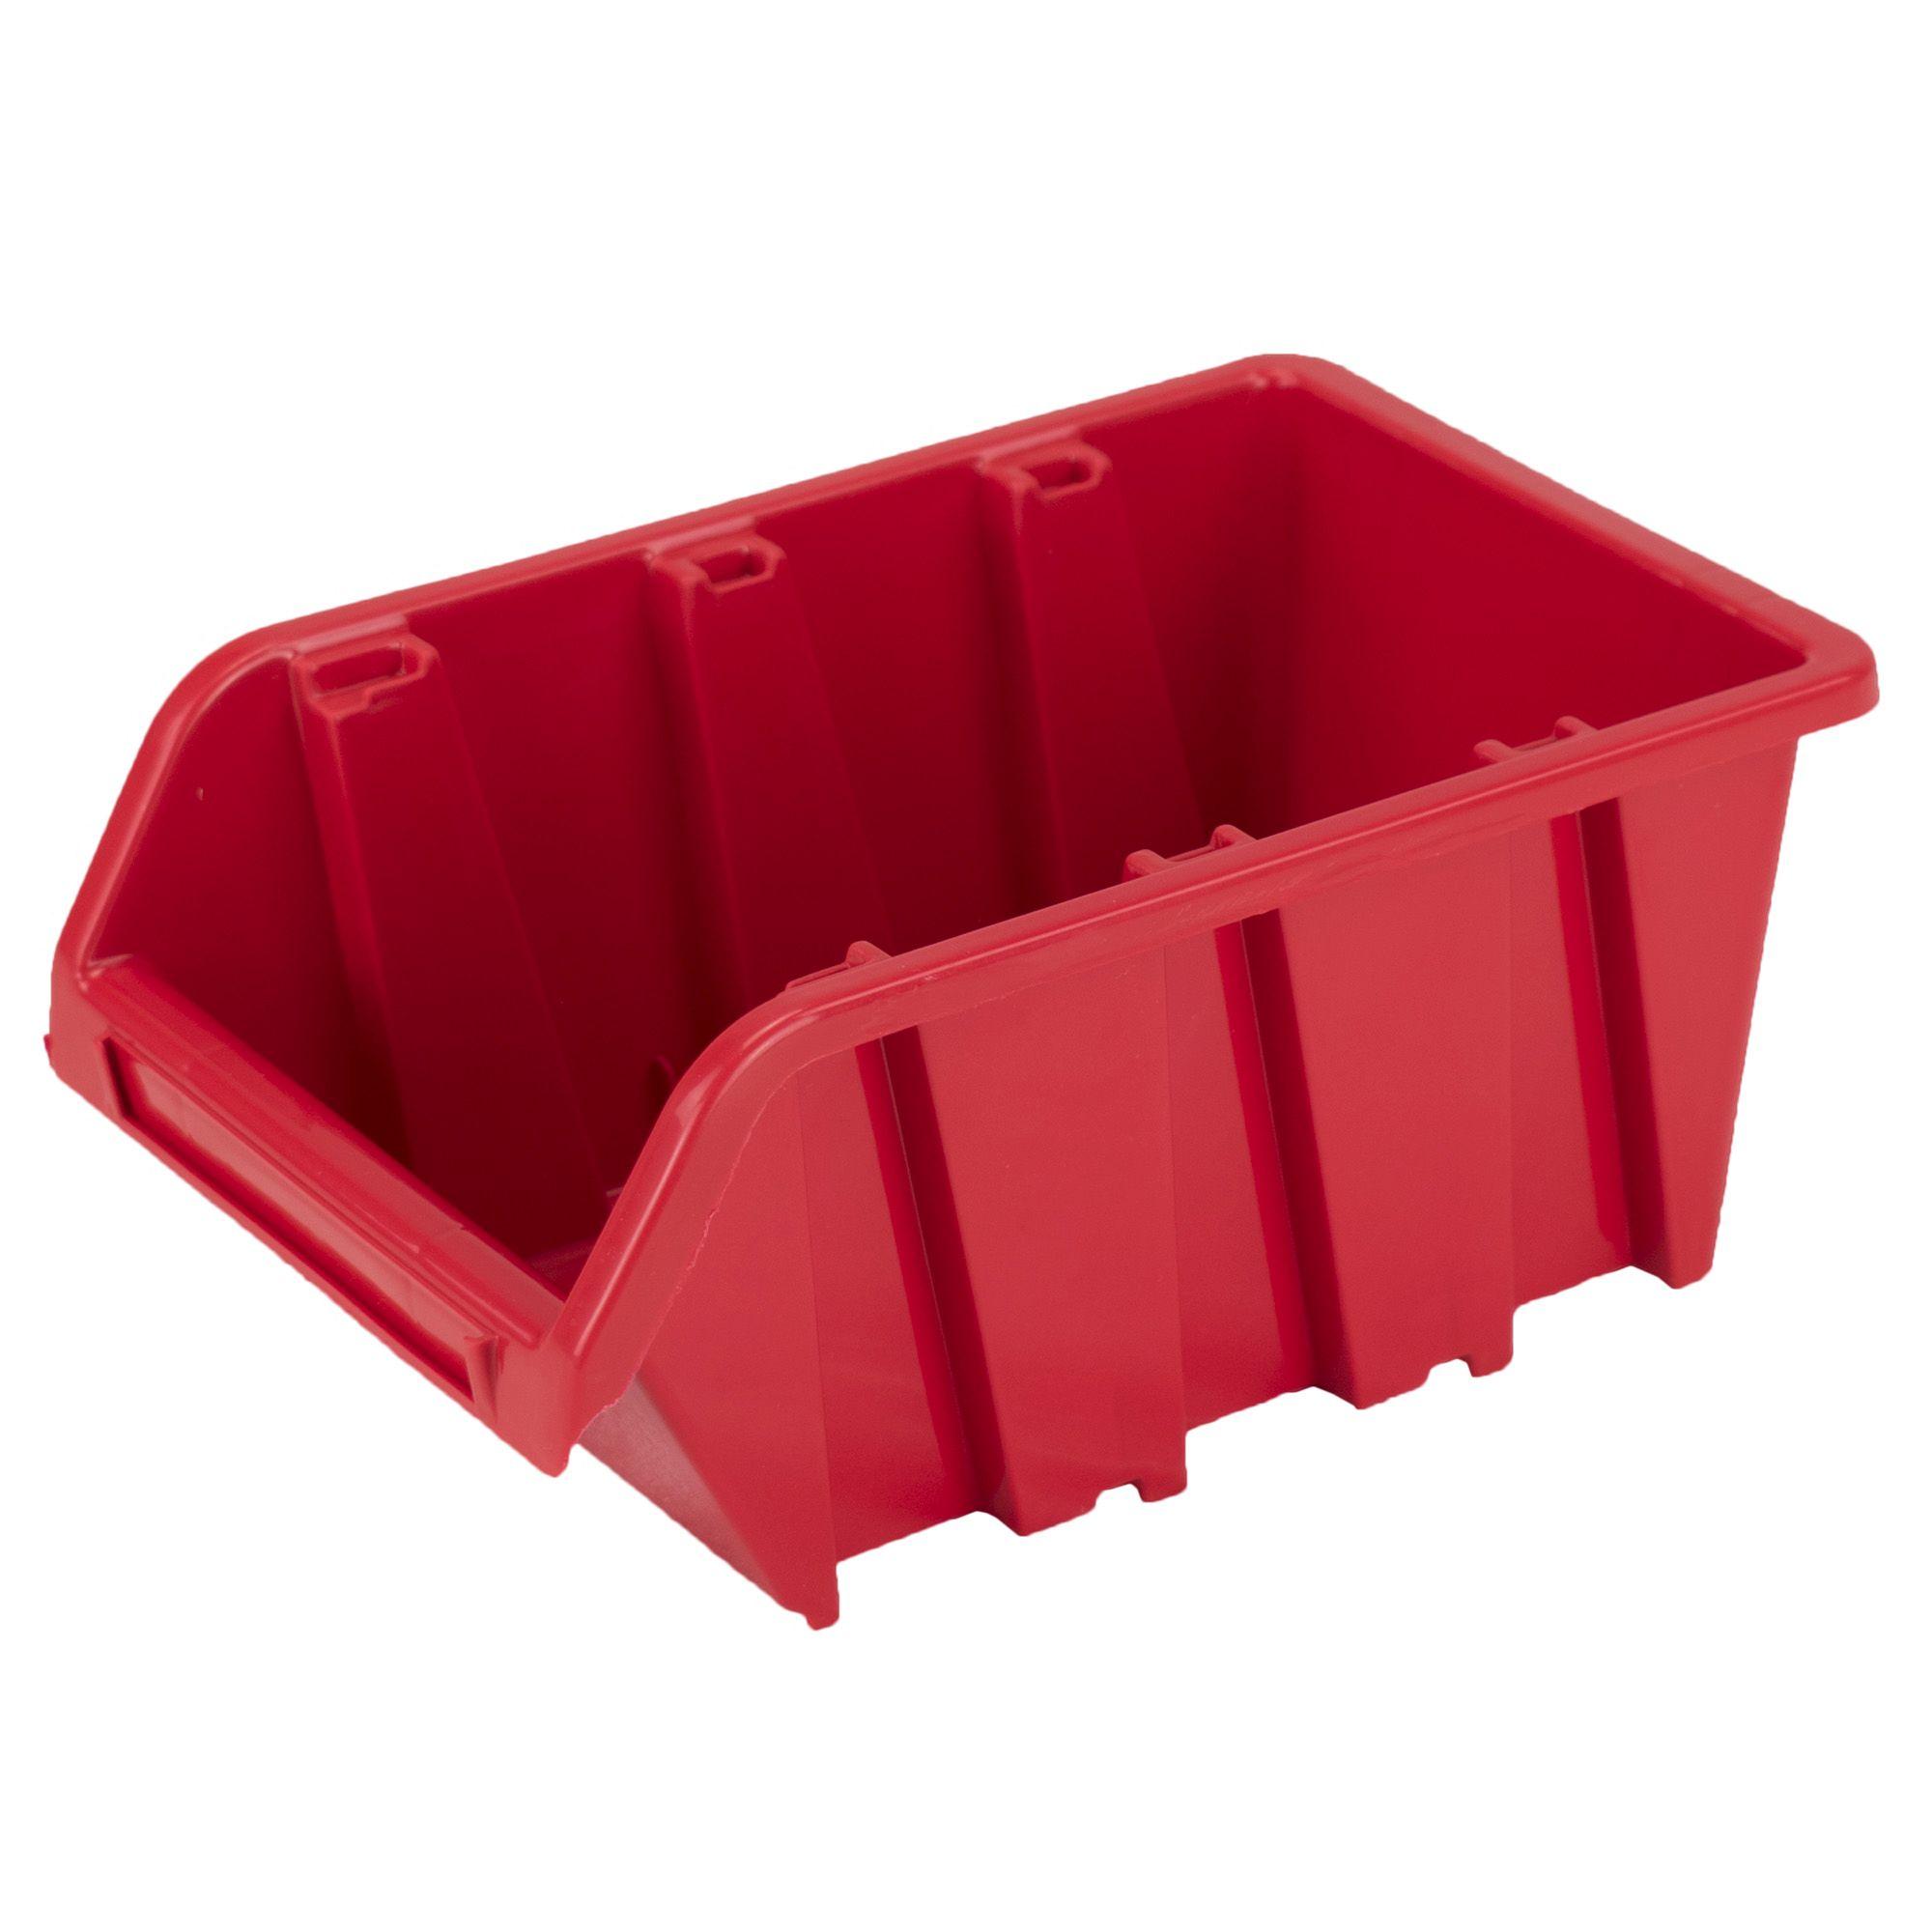 Box úložný TRUCK, NP 6, plast, oranžový, Prosperplast